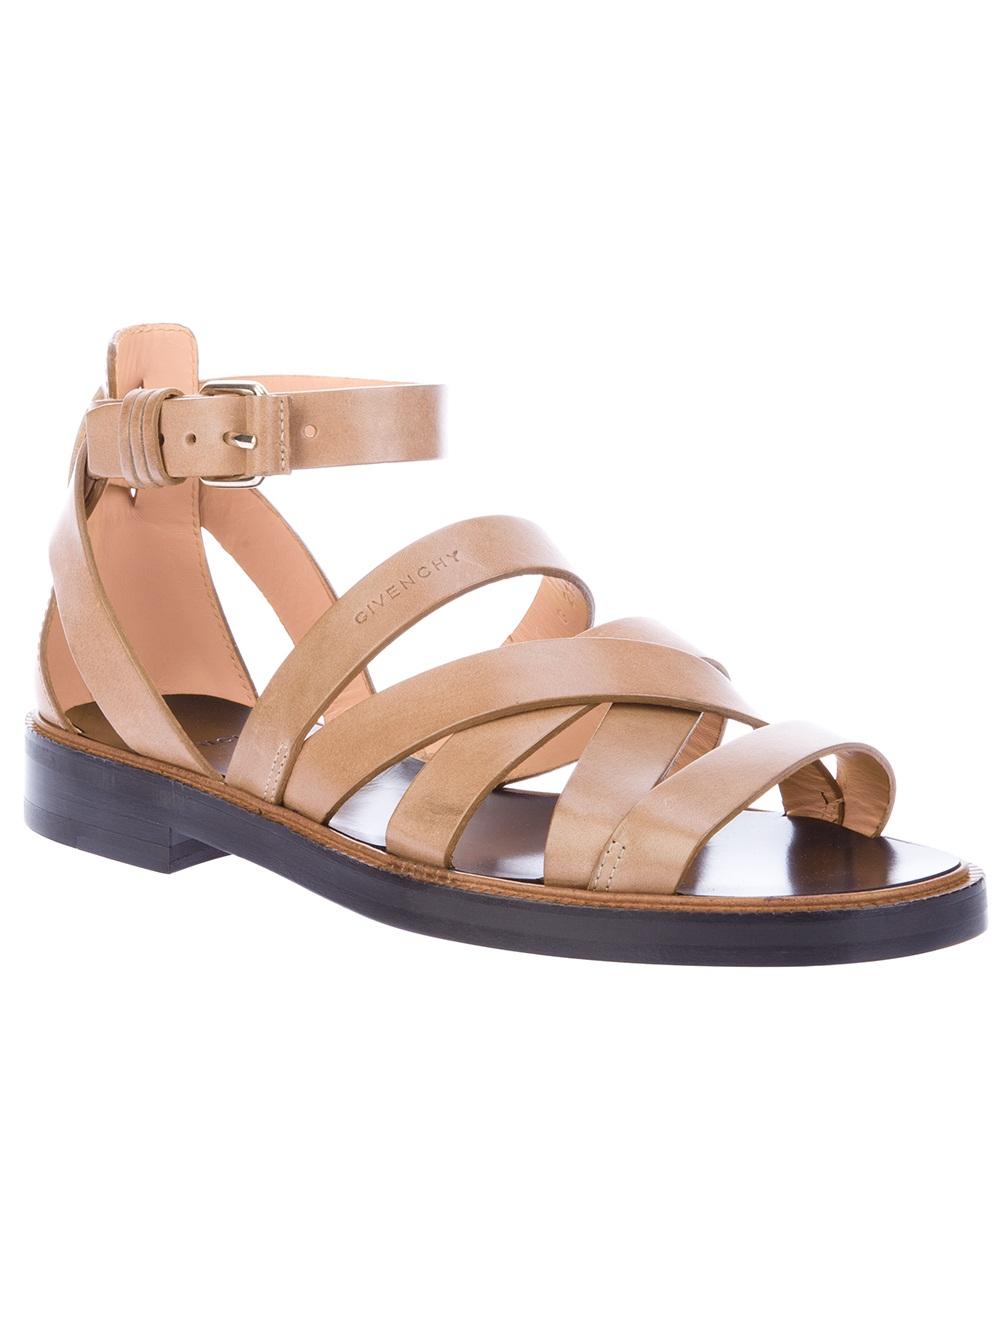 Lyst Givenchy Gladiator Sandal In Brown For Men